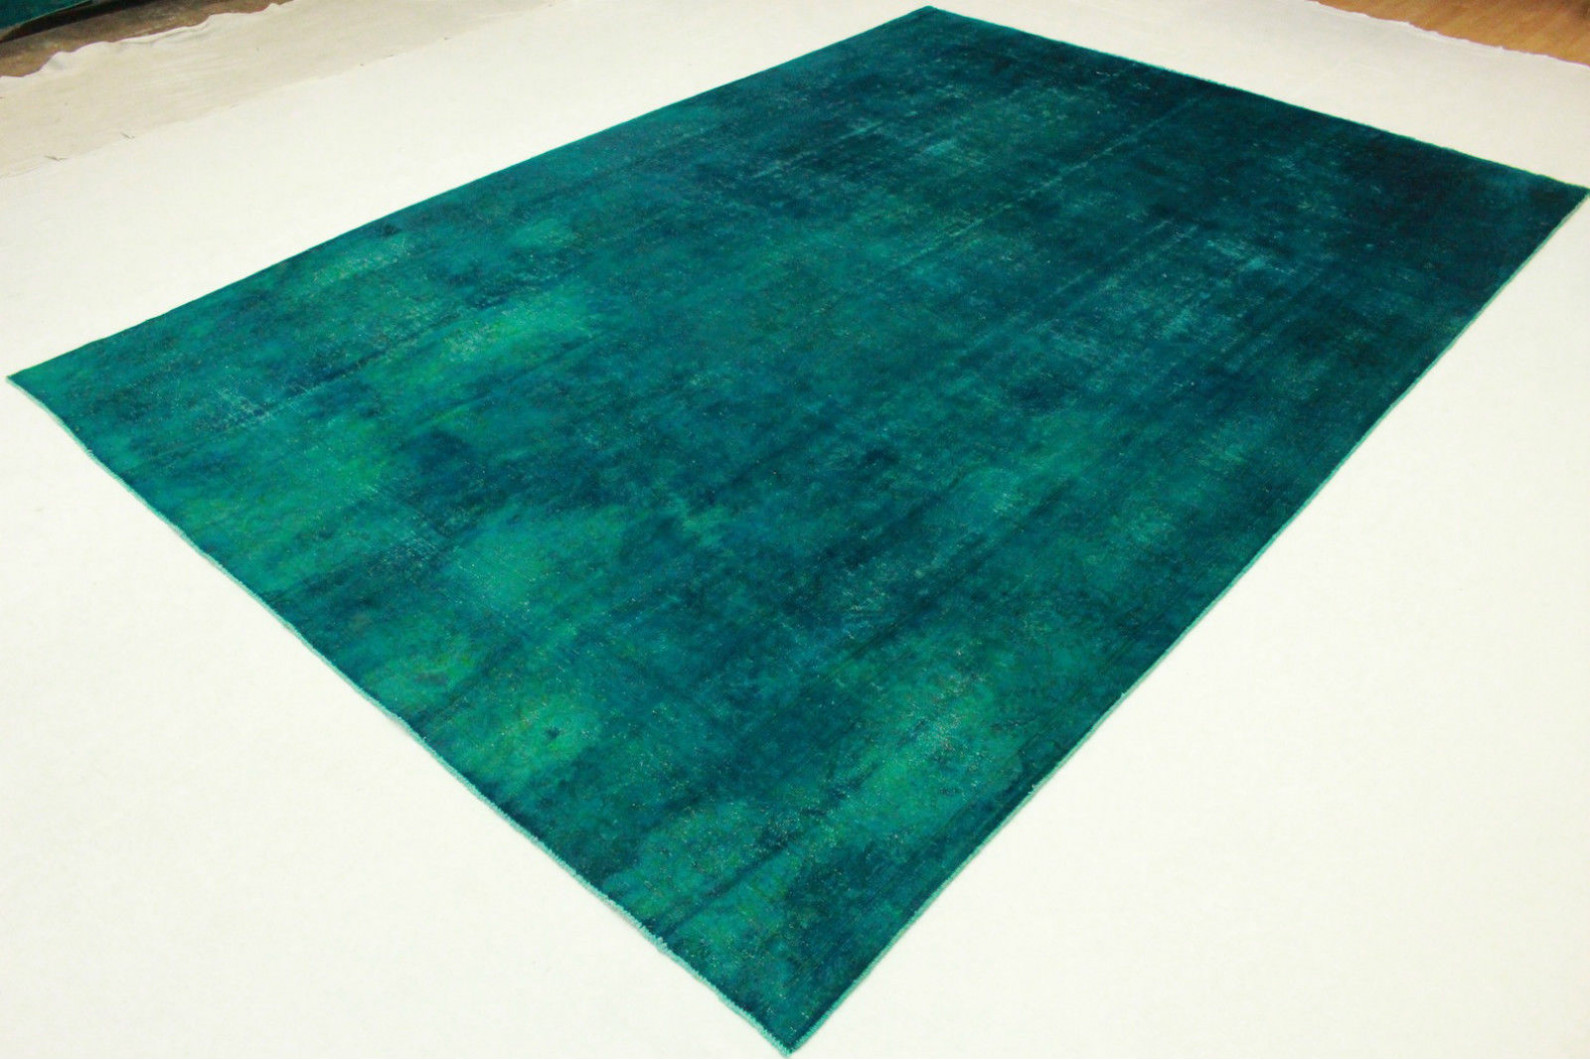 vintage teppich blau t rkis in 410x280cm 1001 3351 bei. Black Bedroom Furniture Sets. Home Design Ideas